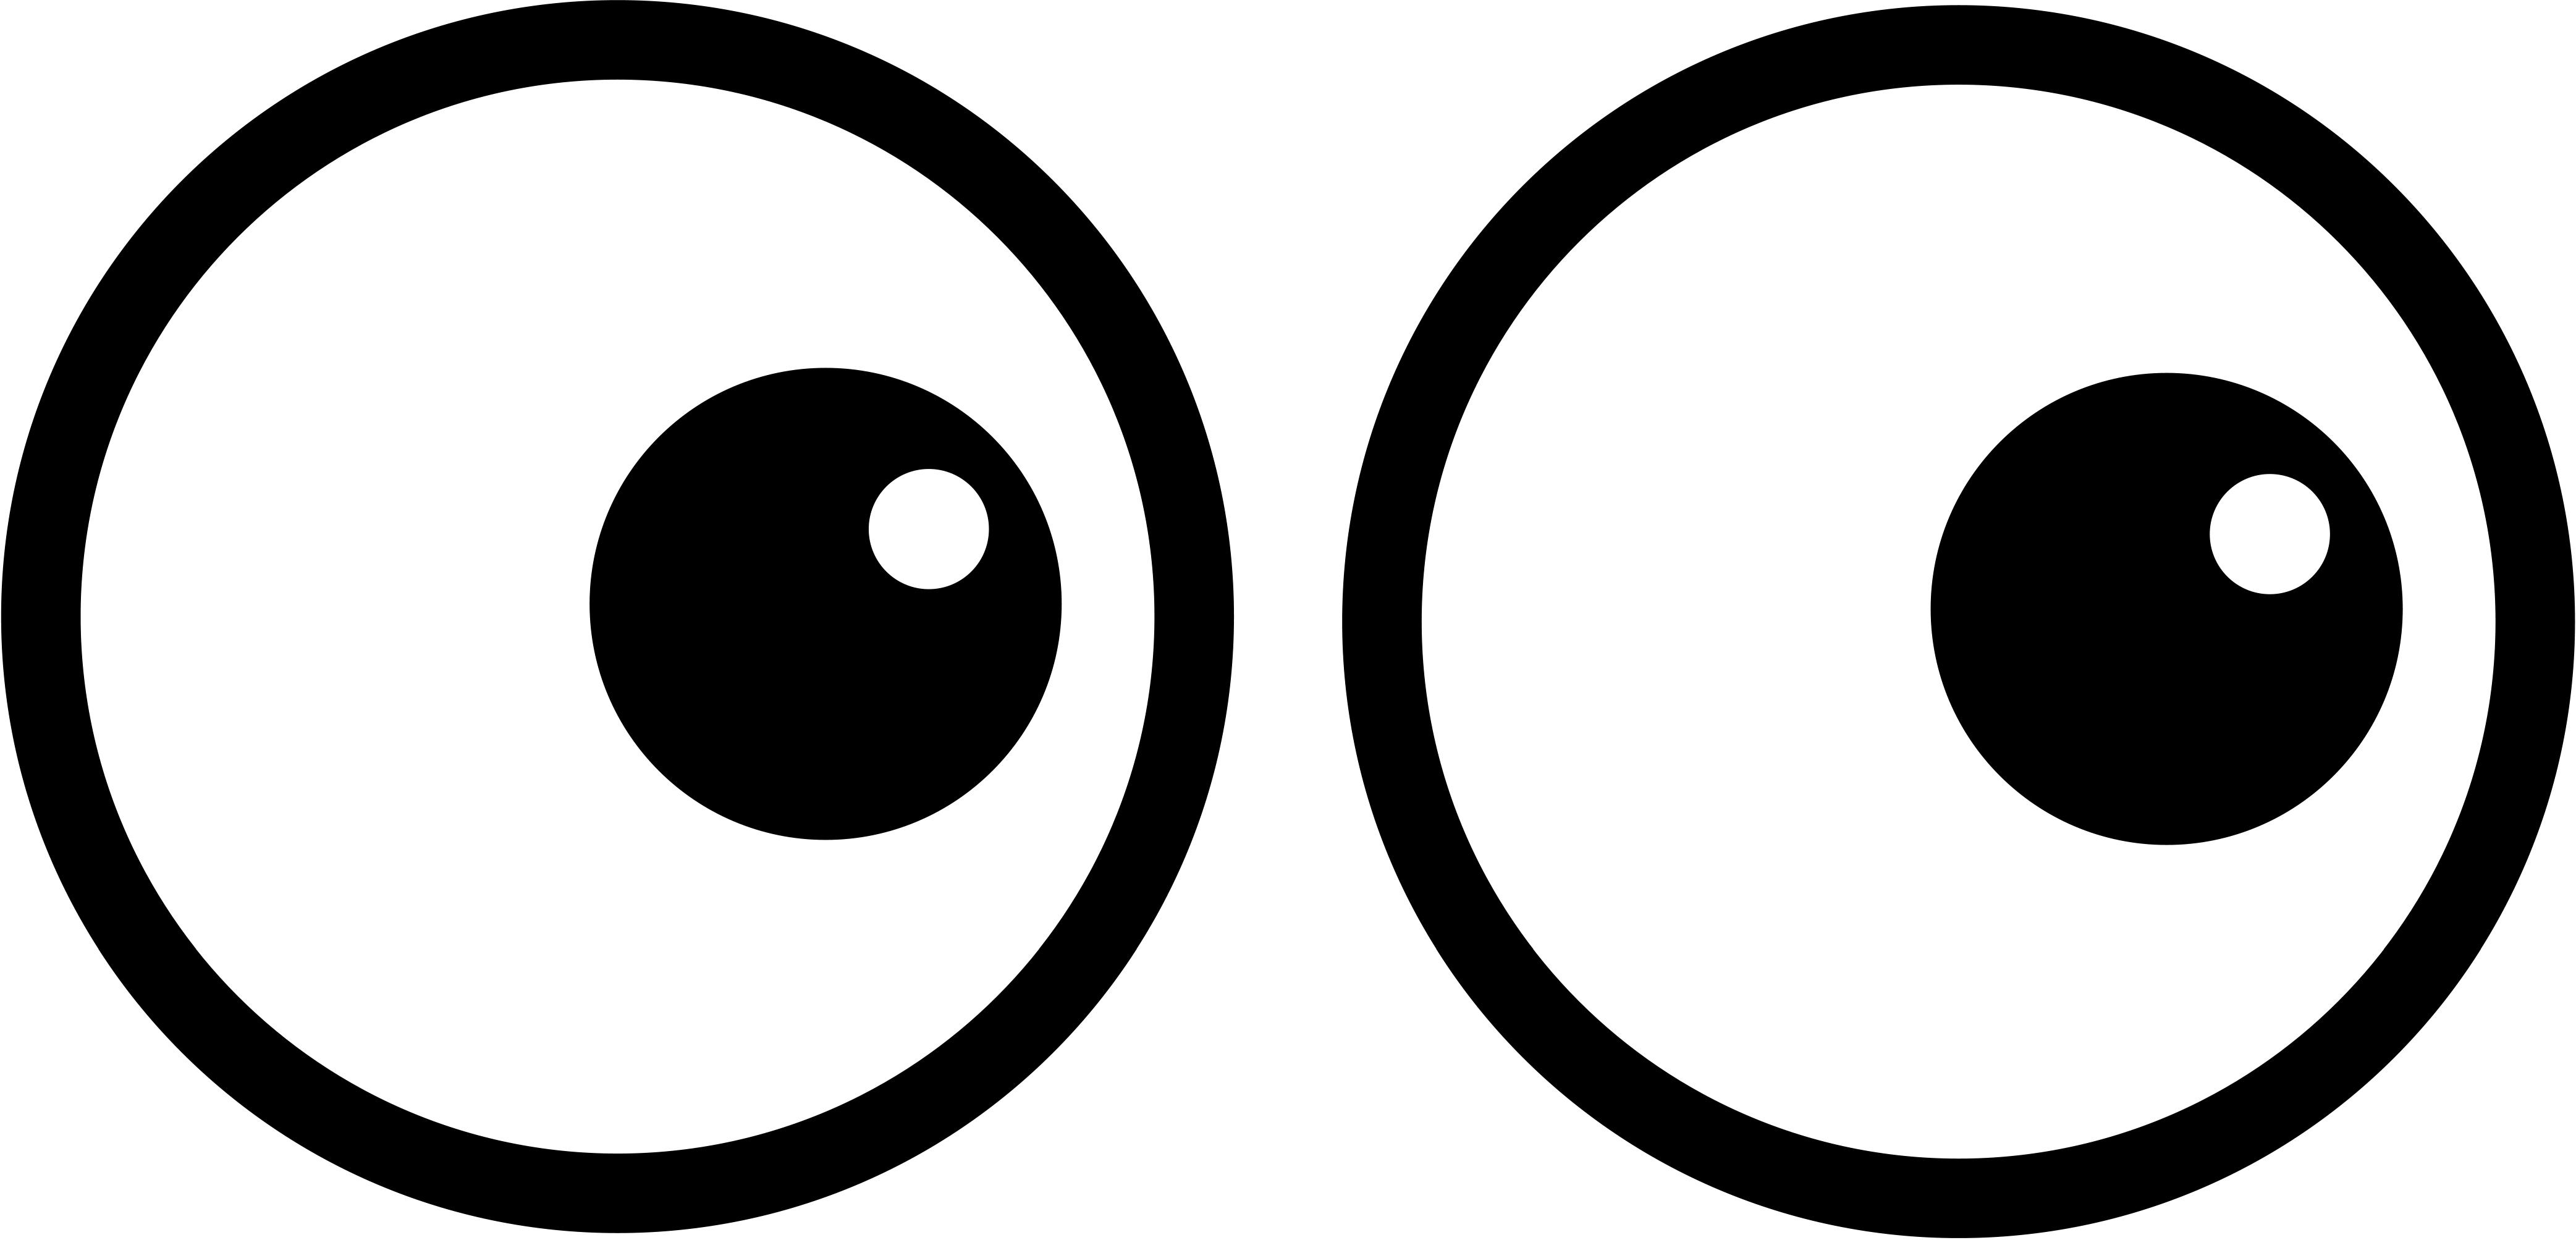 Eyes eye clipart image